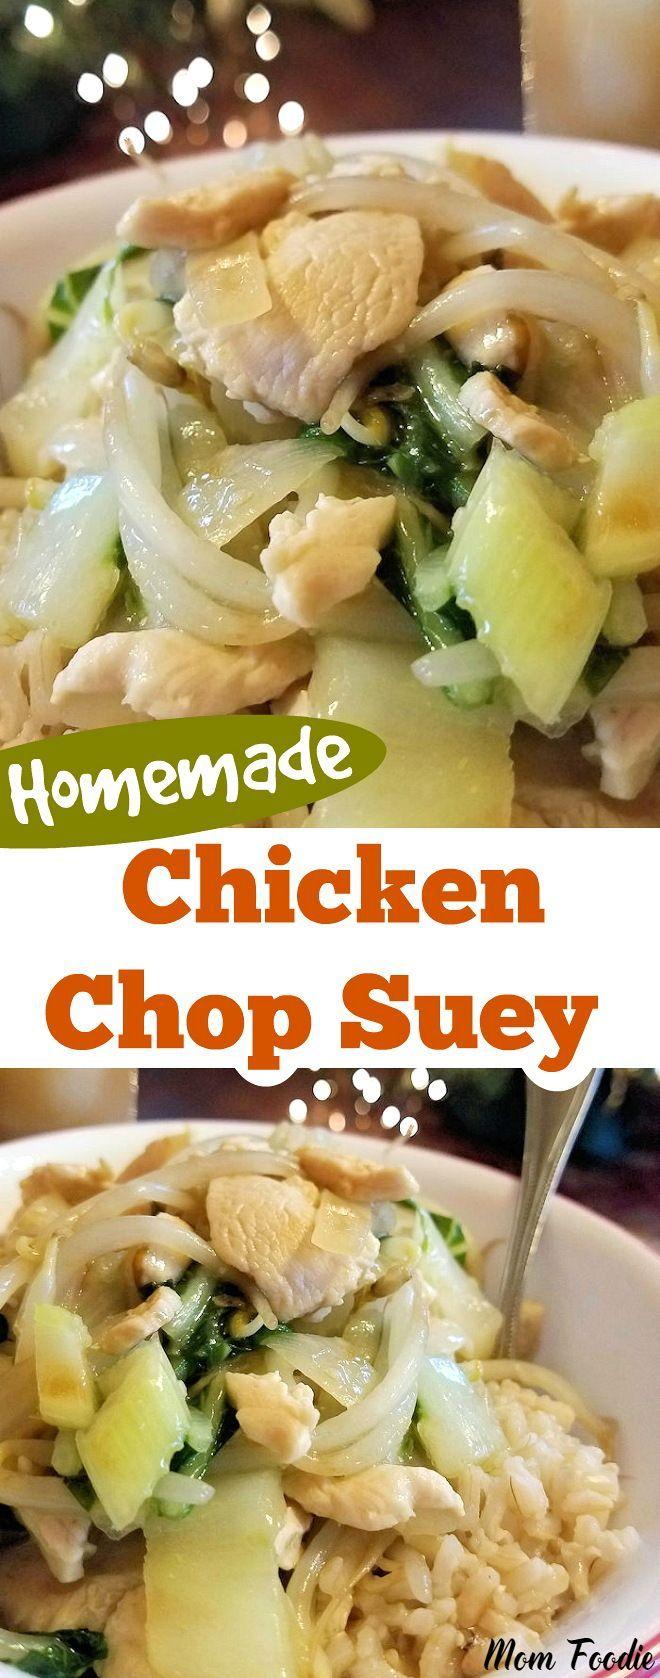 Homemade chicken chop suey and easy chinese dinner theme homemade chicken chop suey and easy chinese dinner theme brightbites forumfinder Gallery